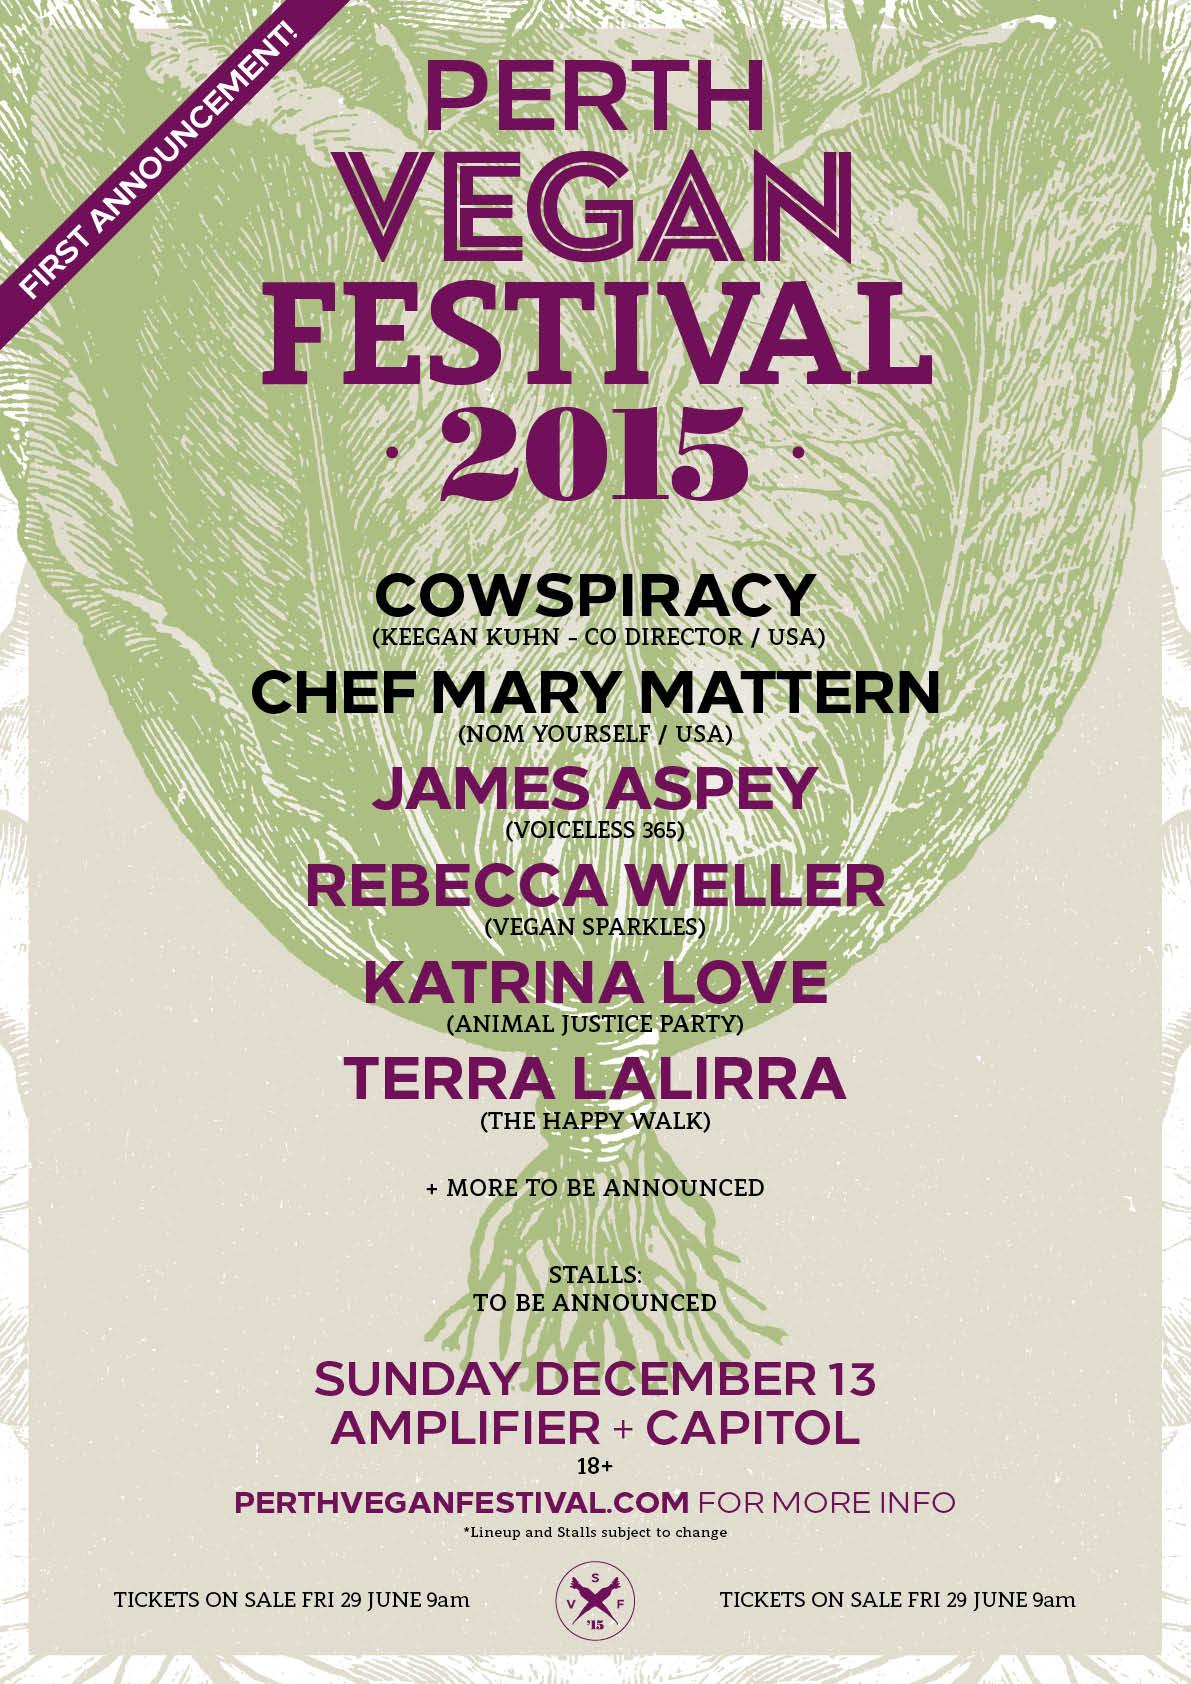 Perth Vegan Festival